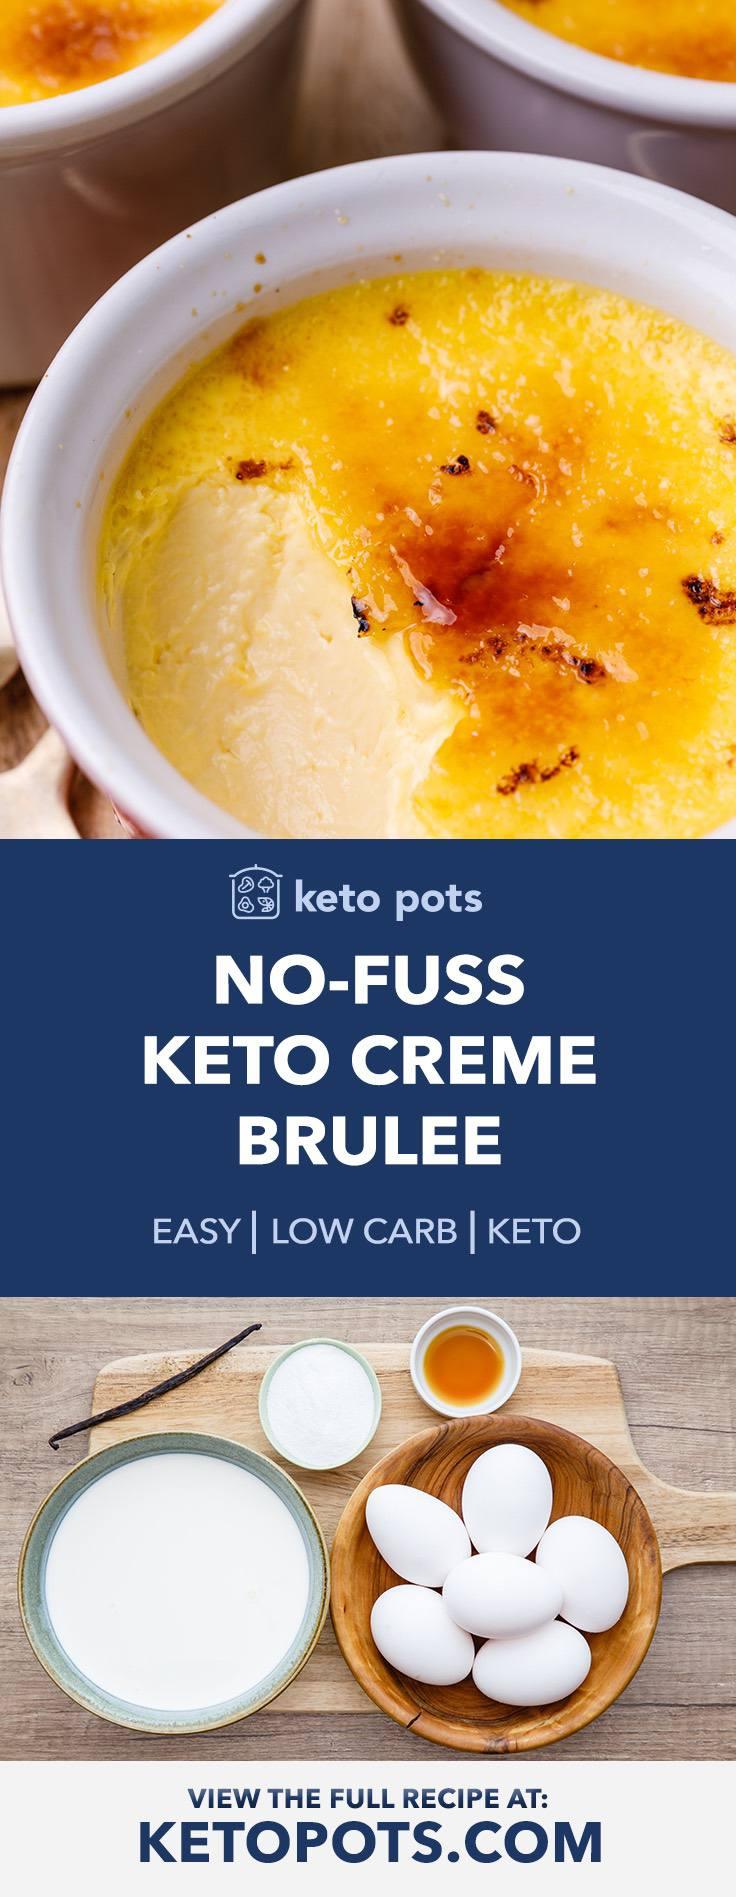 No-Fuss Keto Creme Brulee